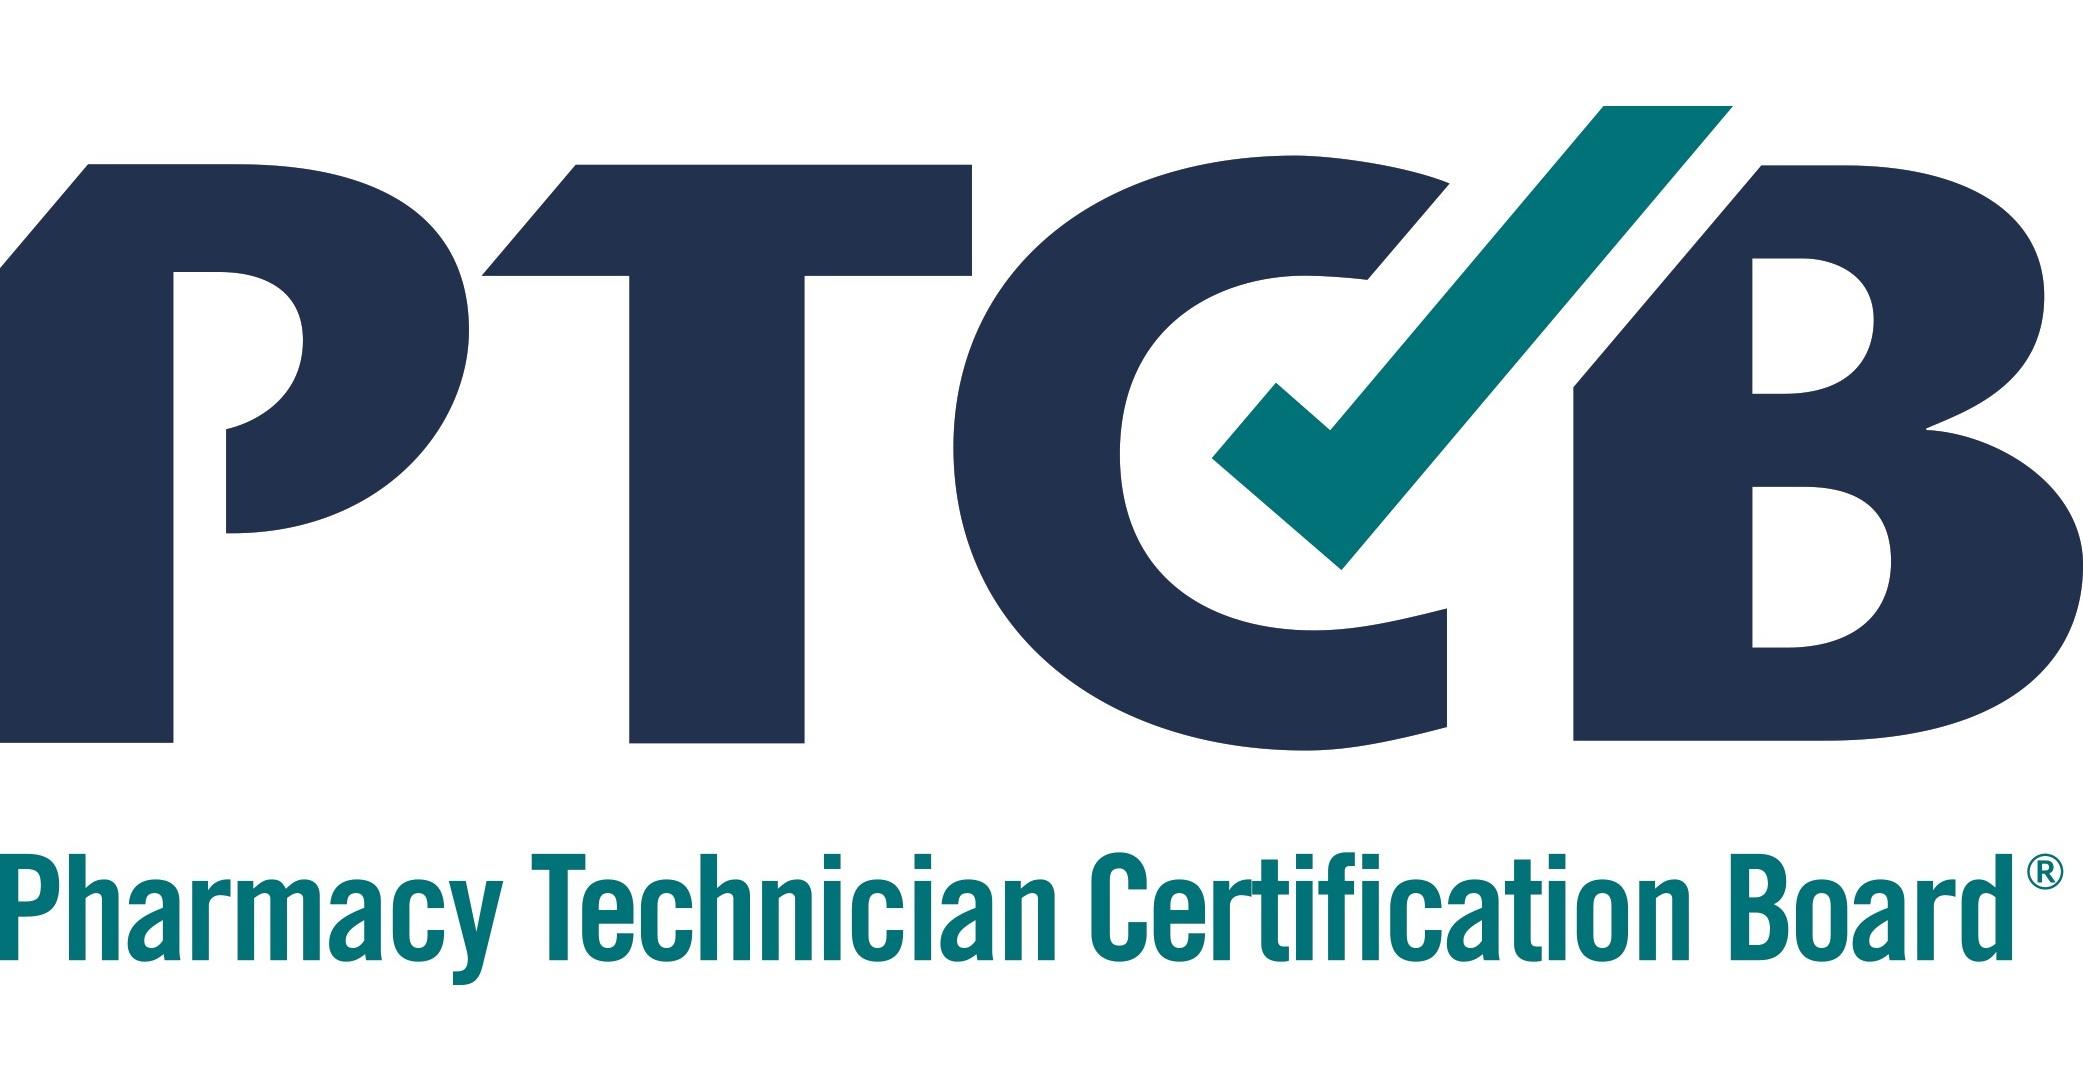 Pharmacy technician certification board ptcb announces success pharmacy technician certification board ptcb announces success of new certified compounded 1betcityfo Gallery